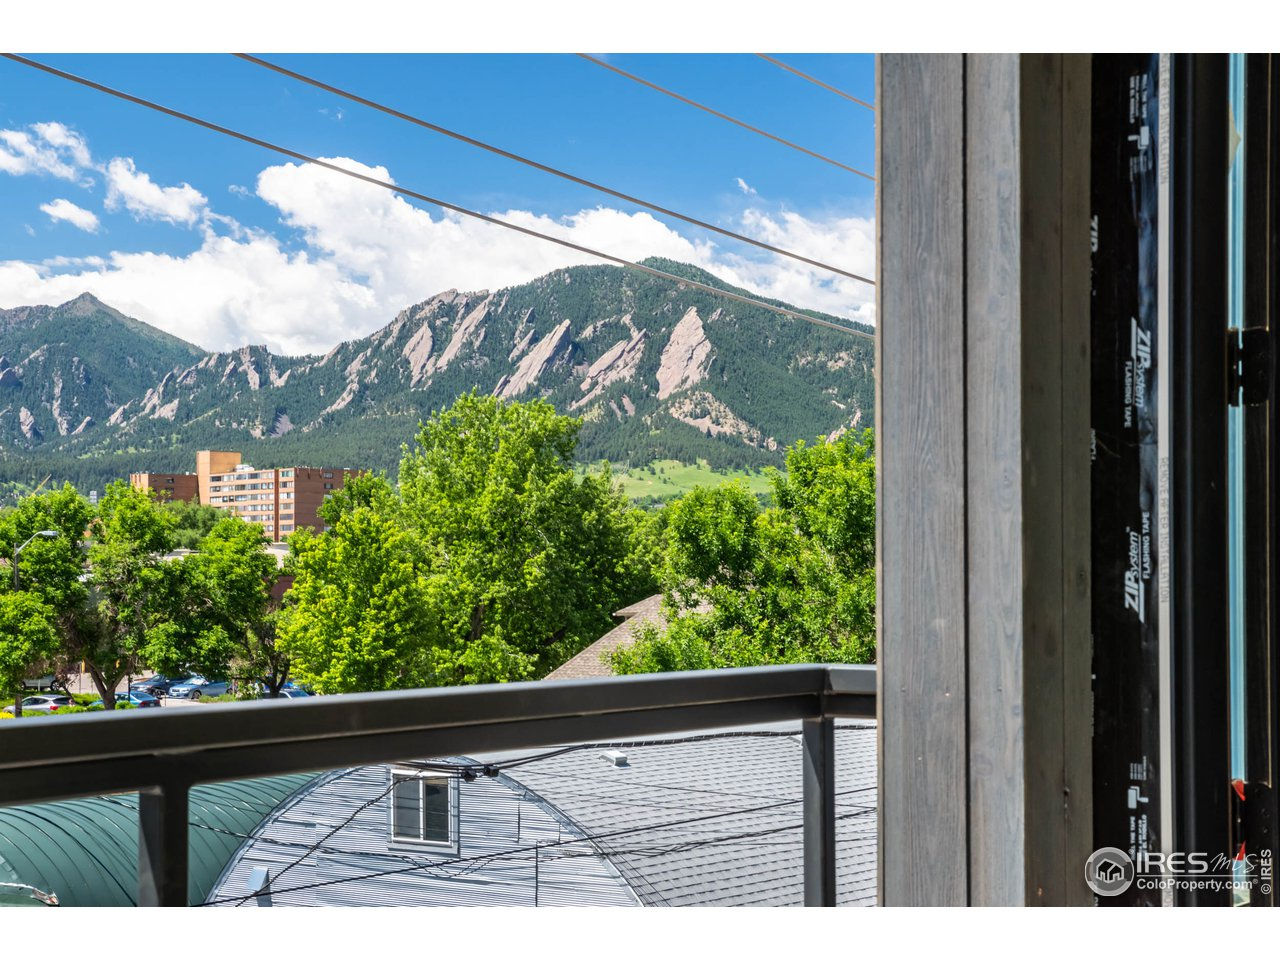 Amazing Flatirons Views from Deck